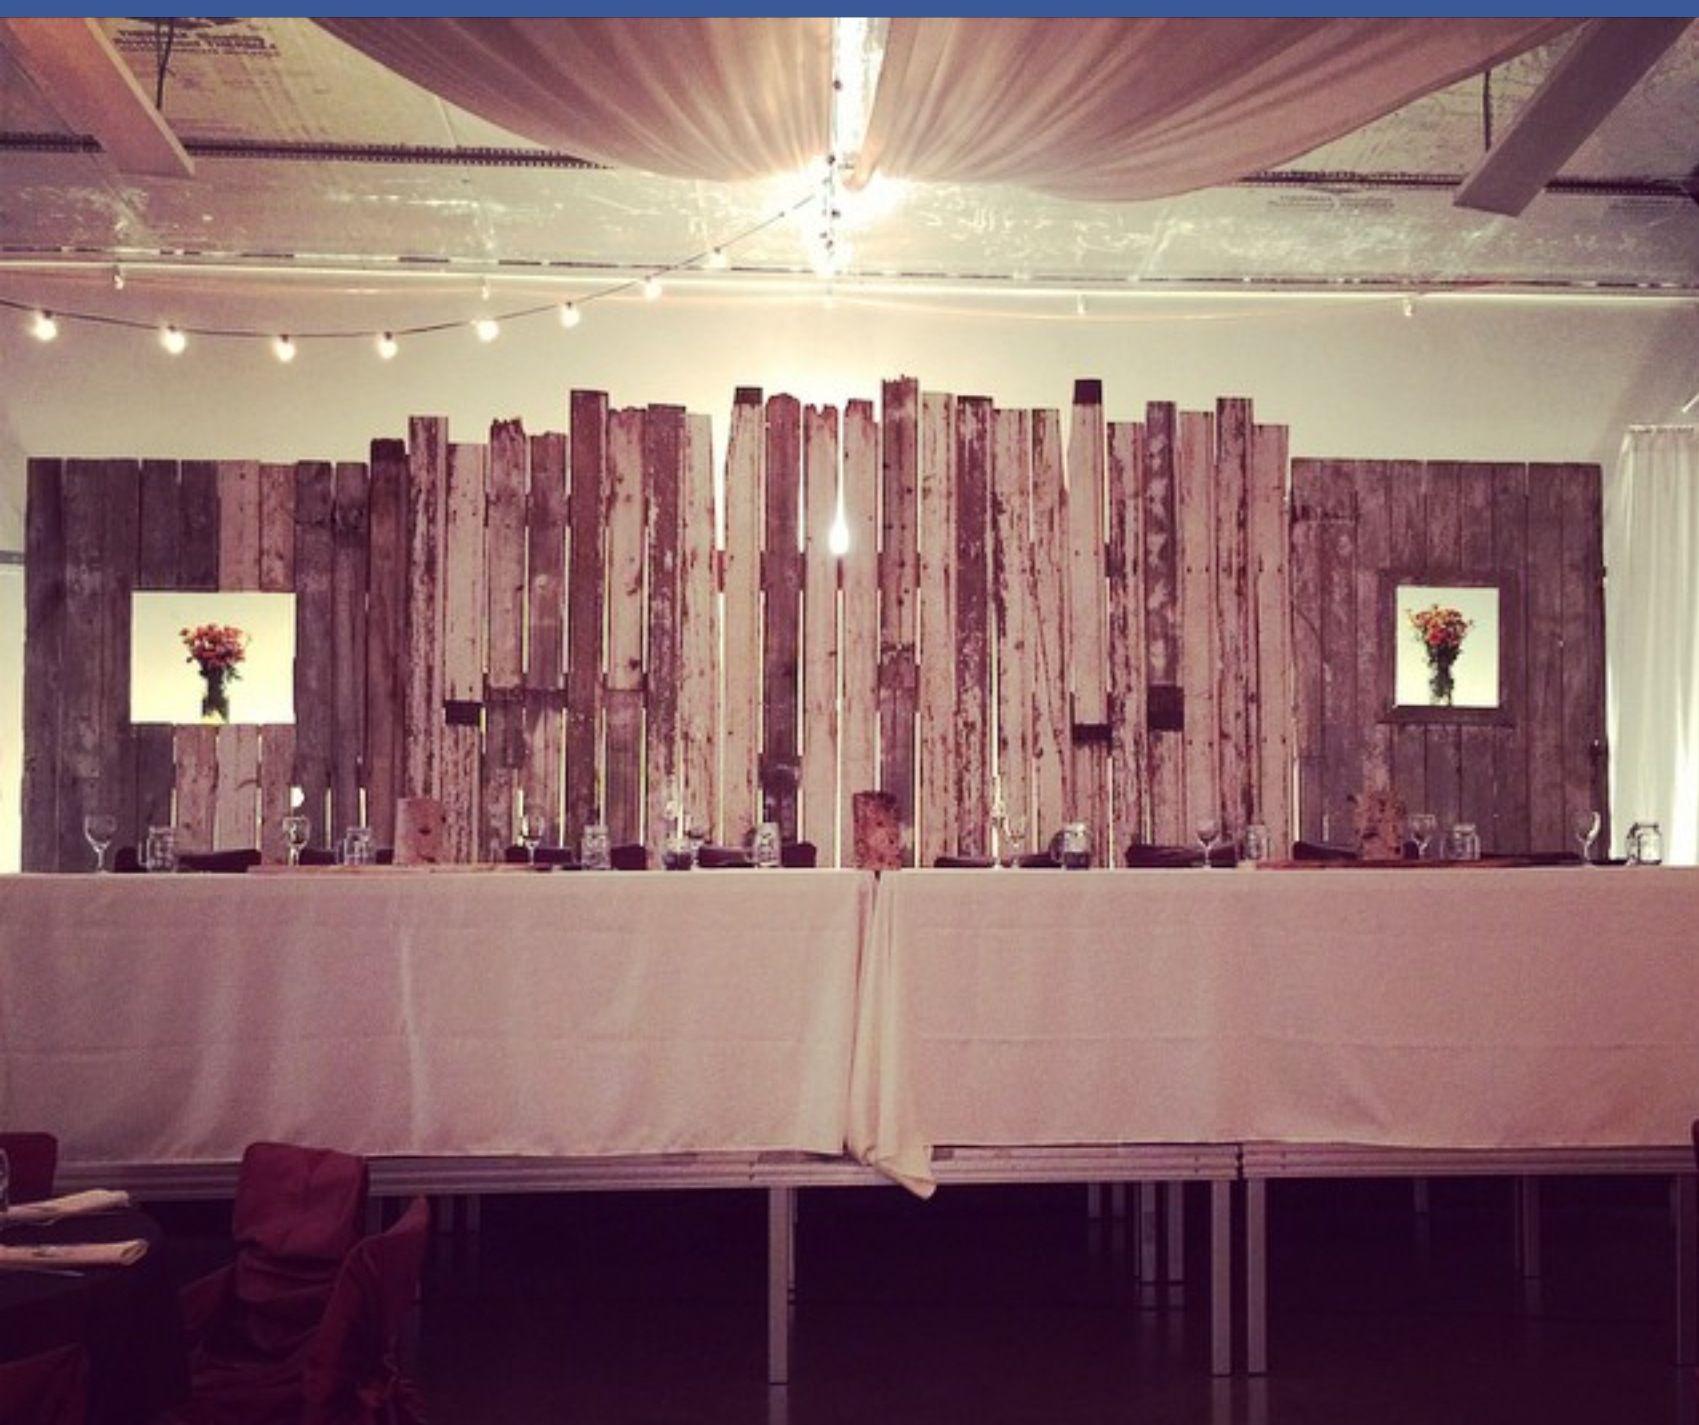 Vintage Wedding Head Table Ideas: Rustic Barn Wood Backdrop For Head Table At Wedding